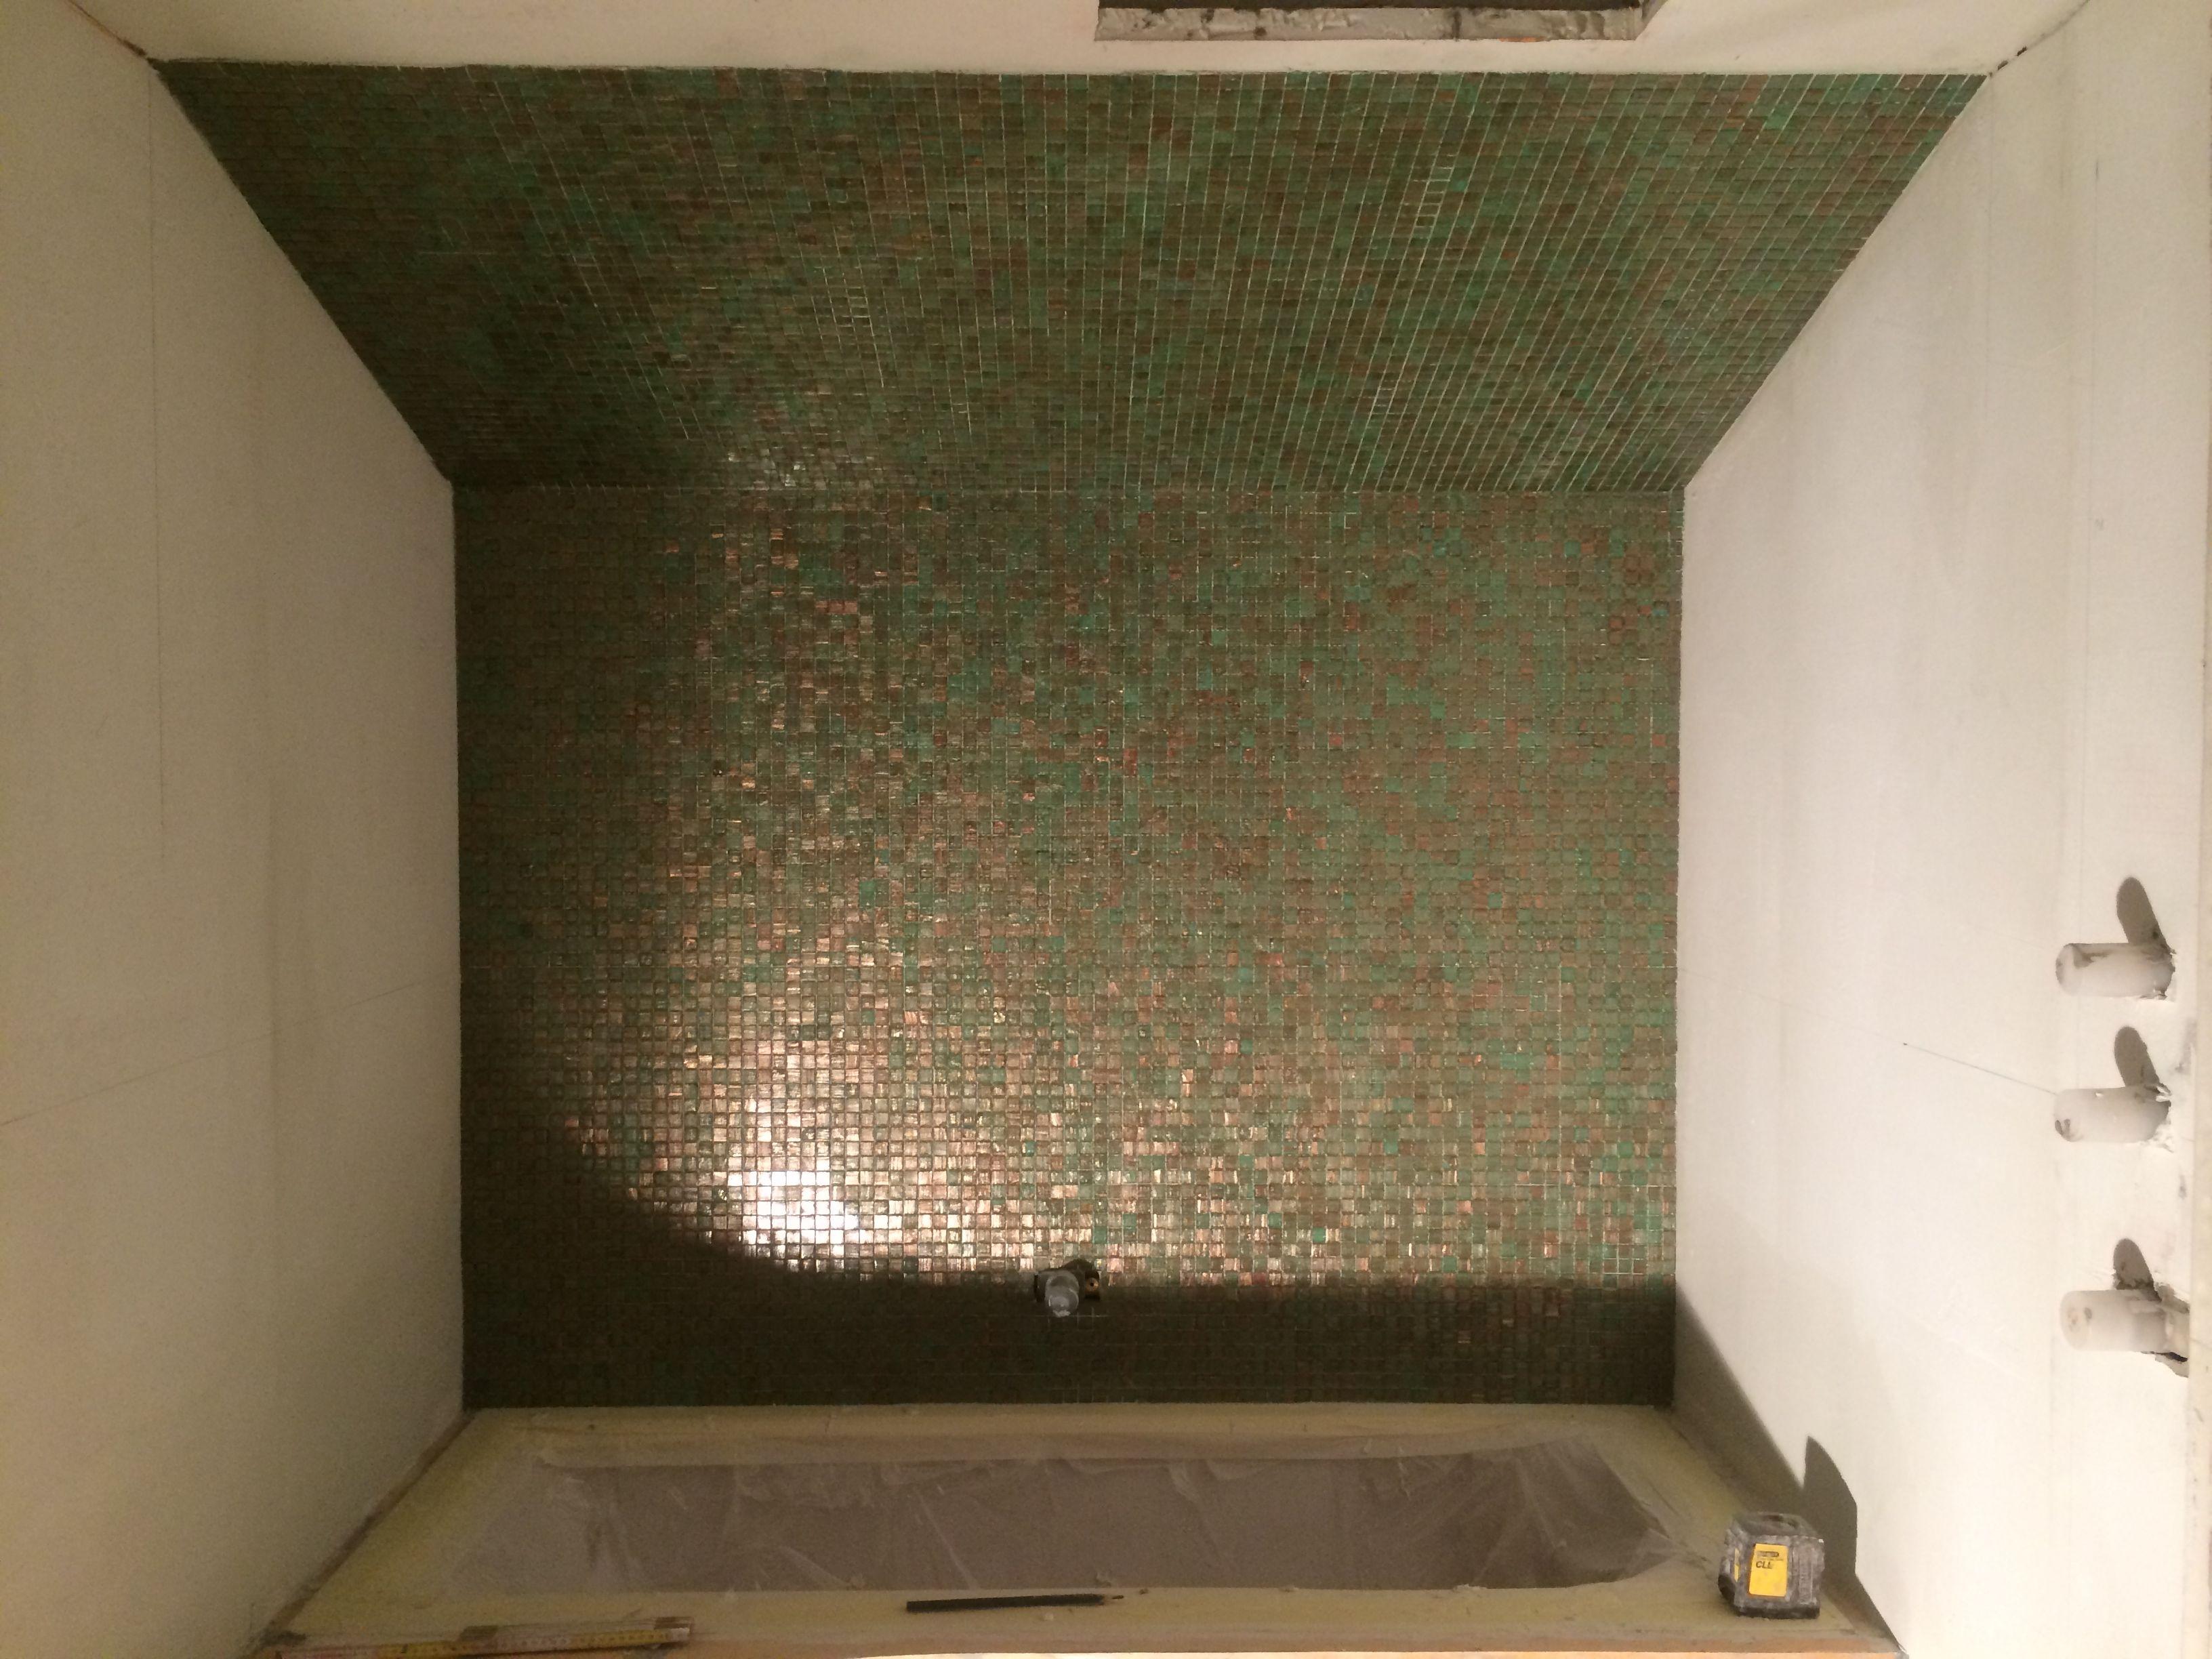 Kerakoll design house meinardi - Rivestimento bagno economico ...